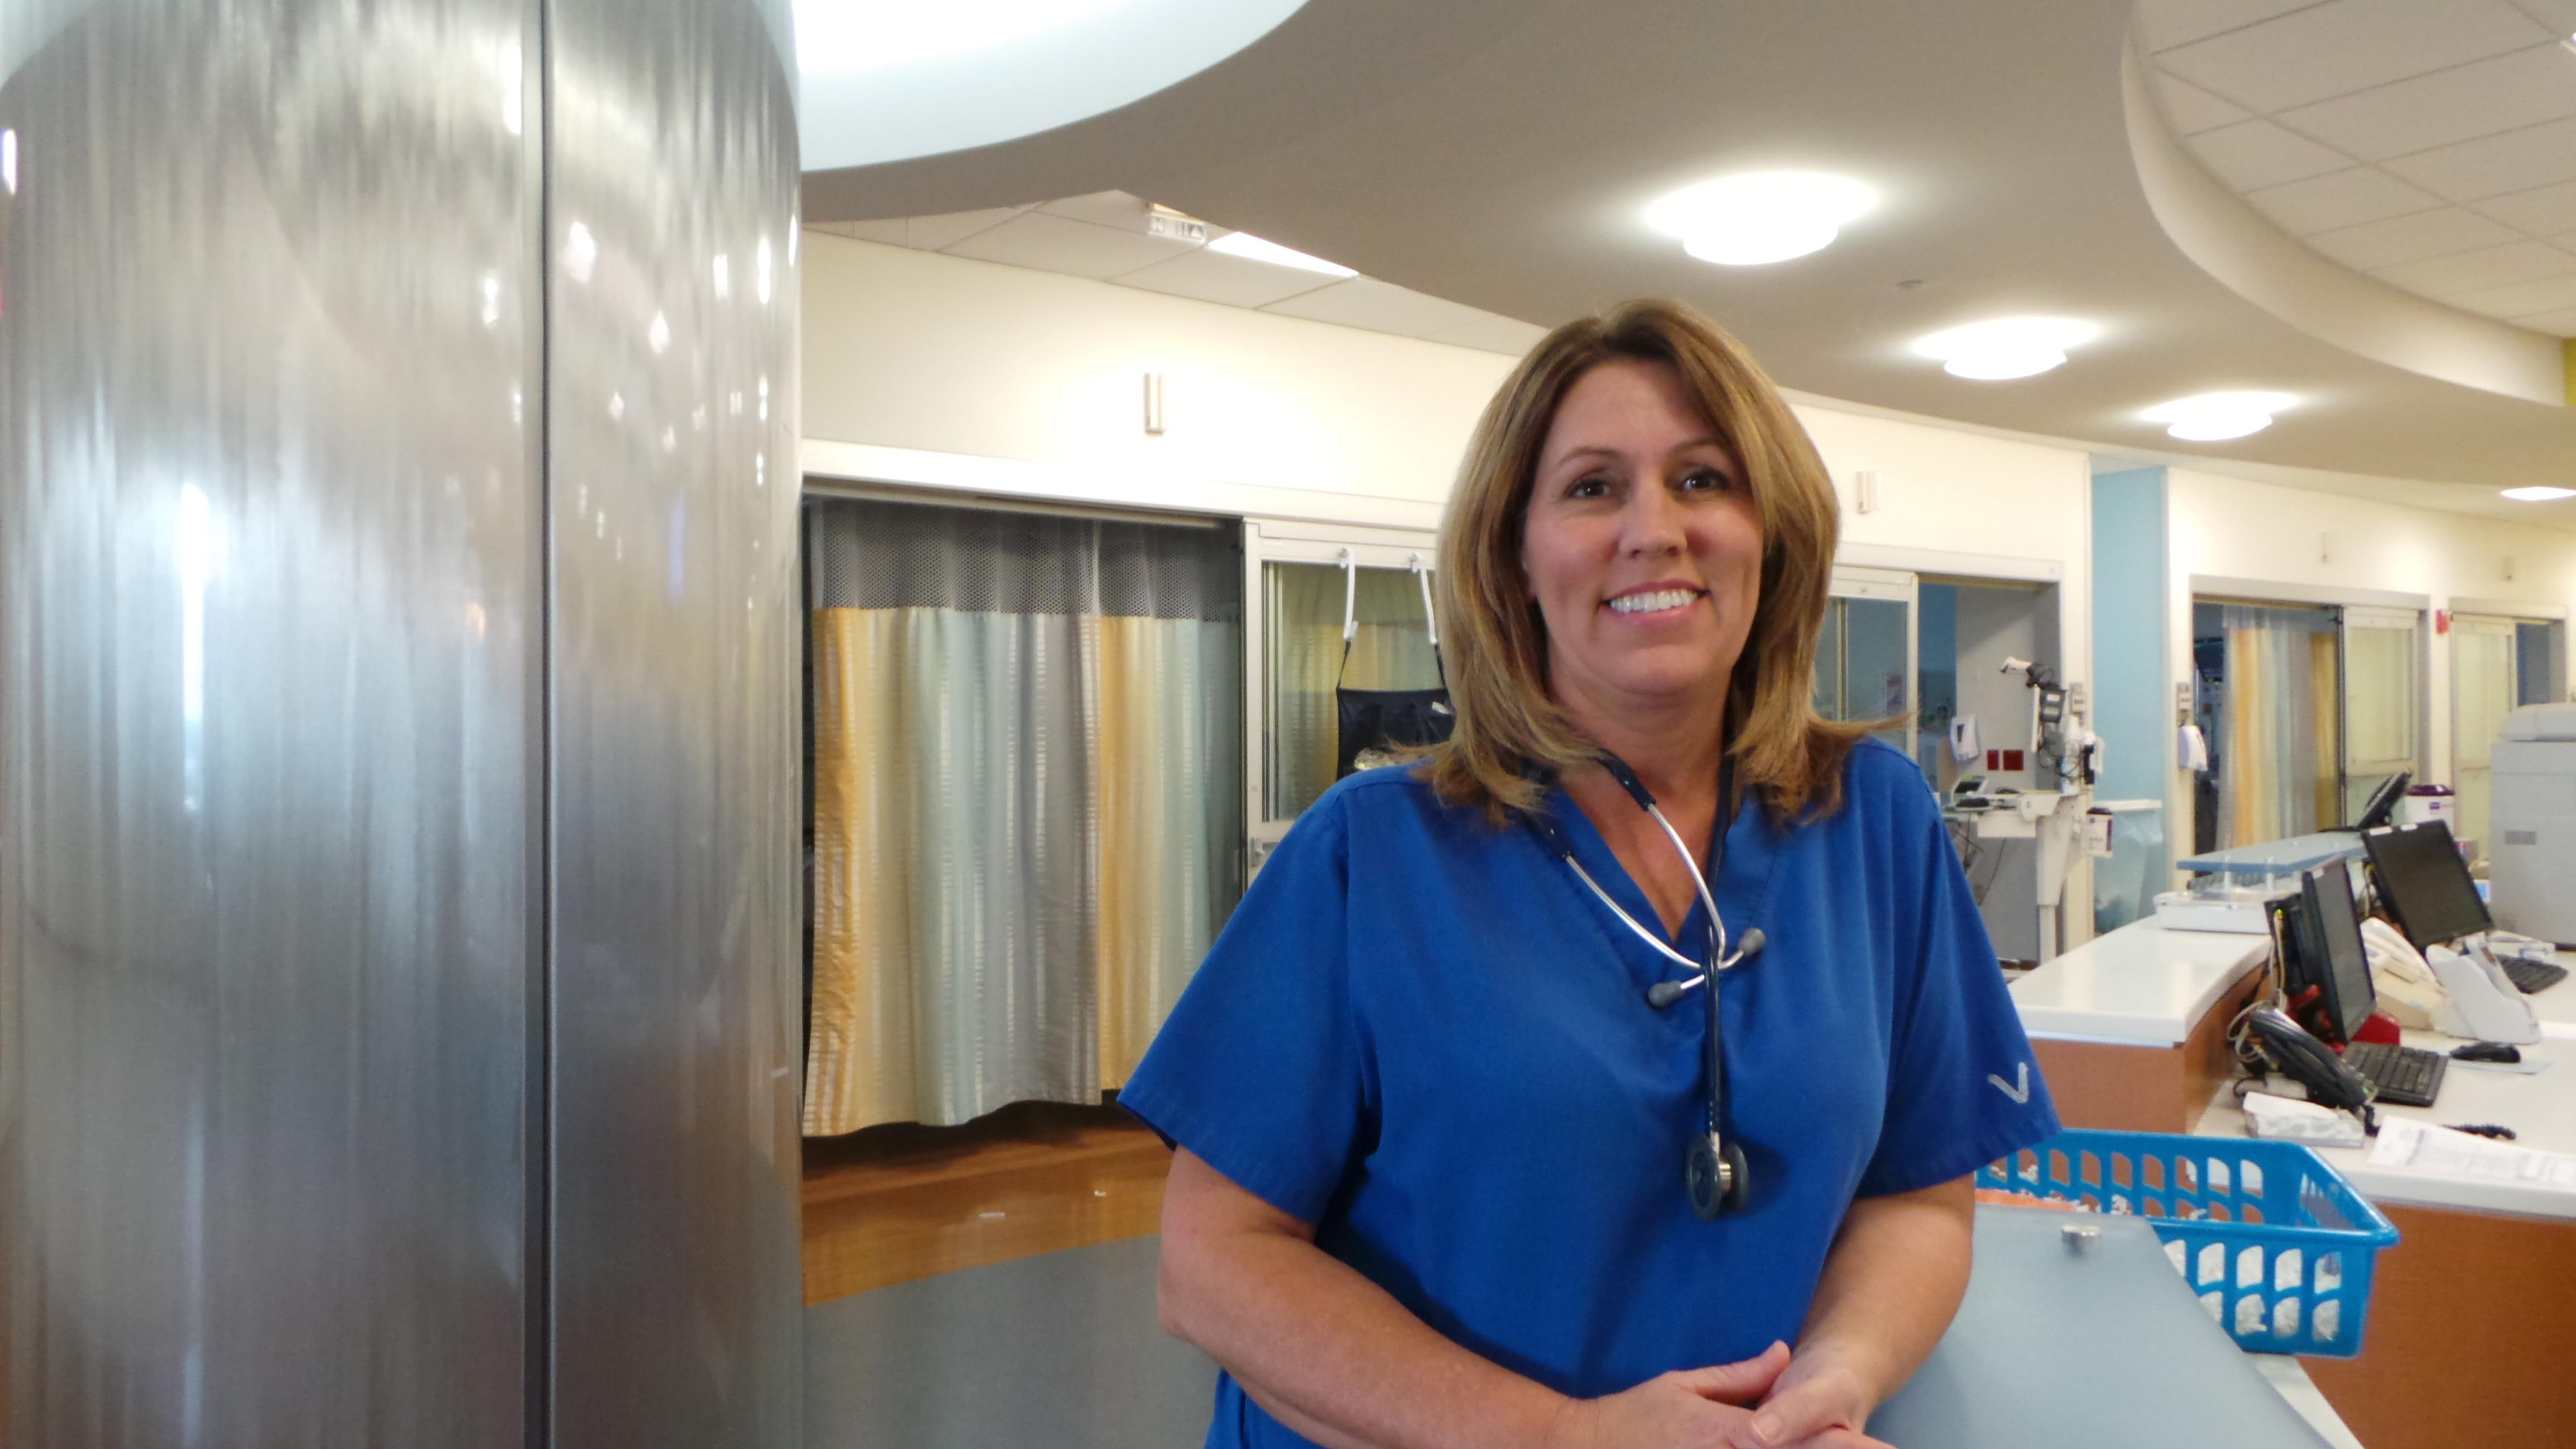 Linda Shriner, nurse at Baptist Health